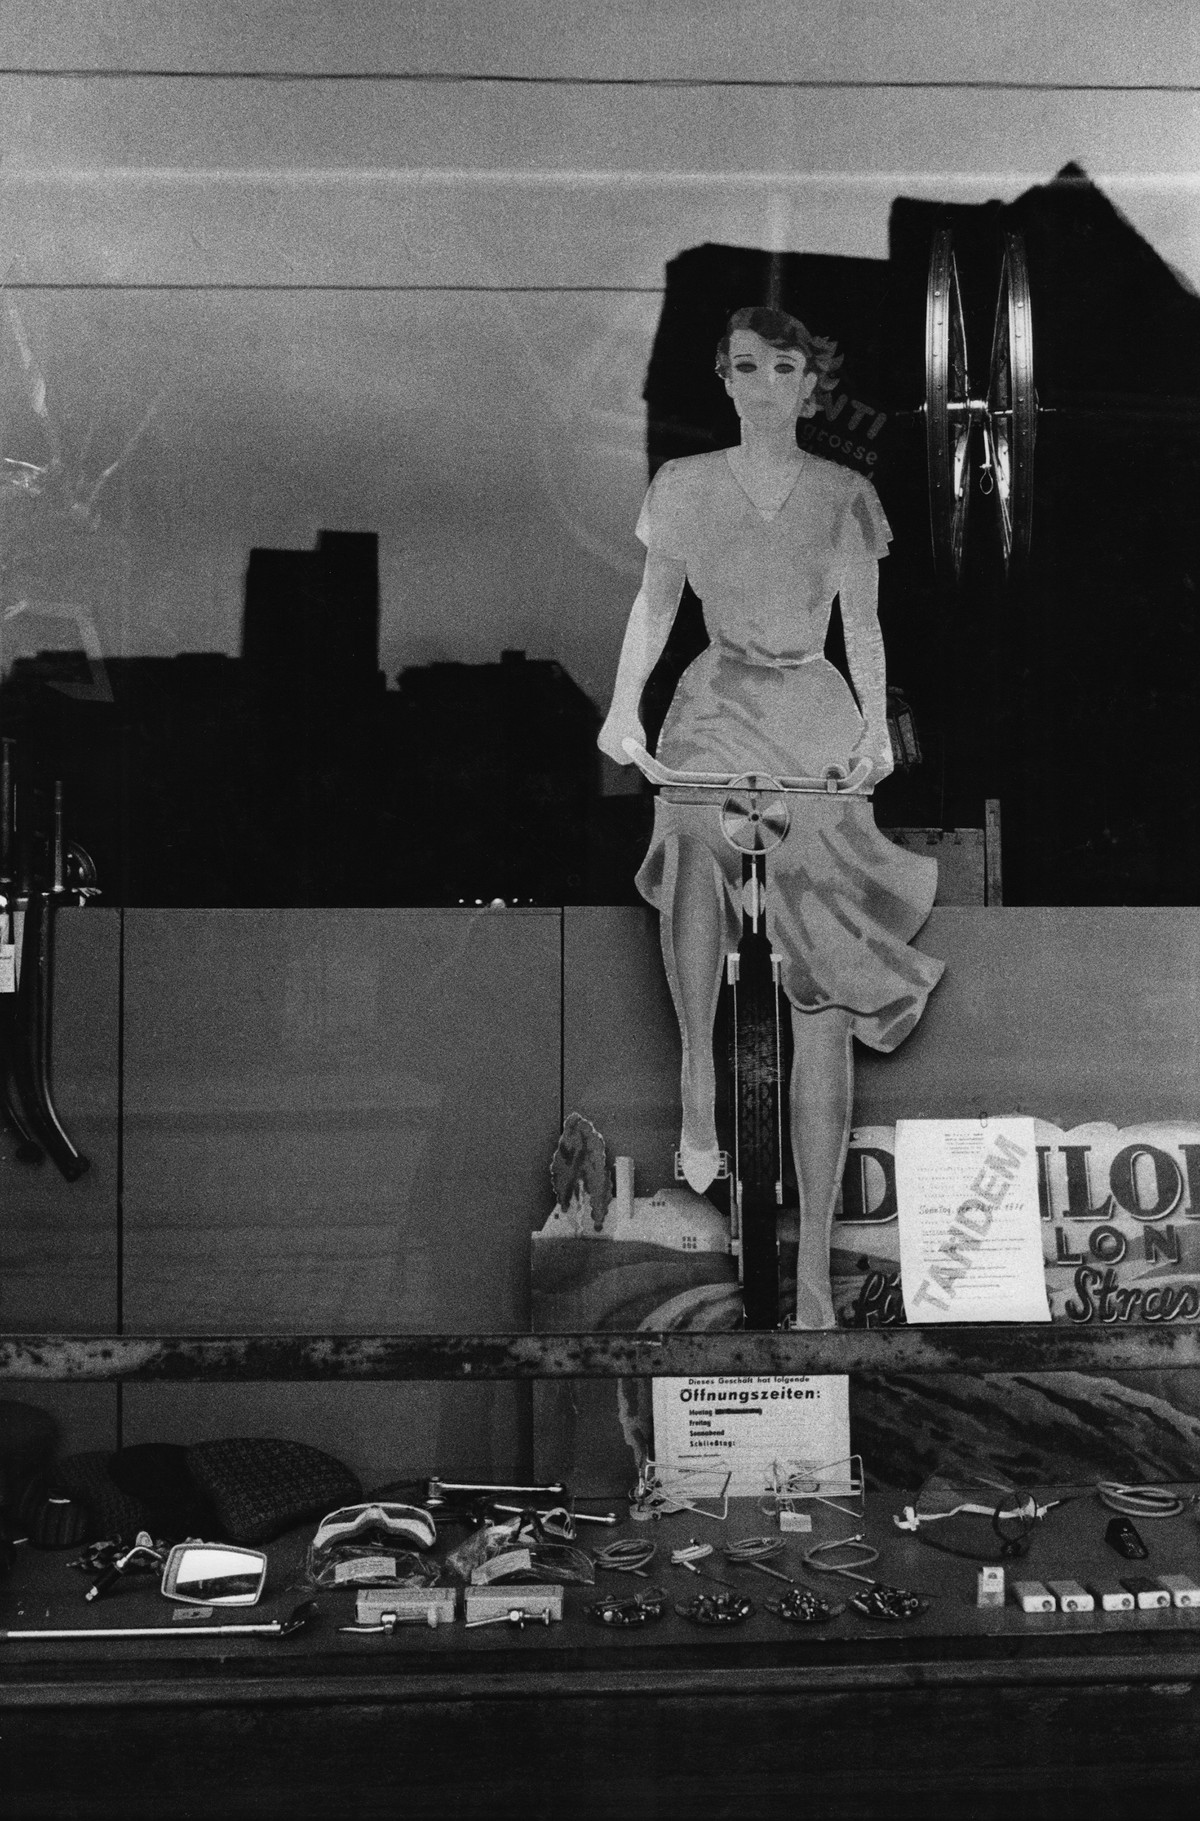 Sibylle Bergemann, Rosenthaler Straße, Berlin, 1976, courtesy Loock Galerie ©Nachlass Sibylle Bergemann; Ostkreuz